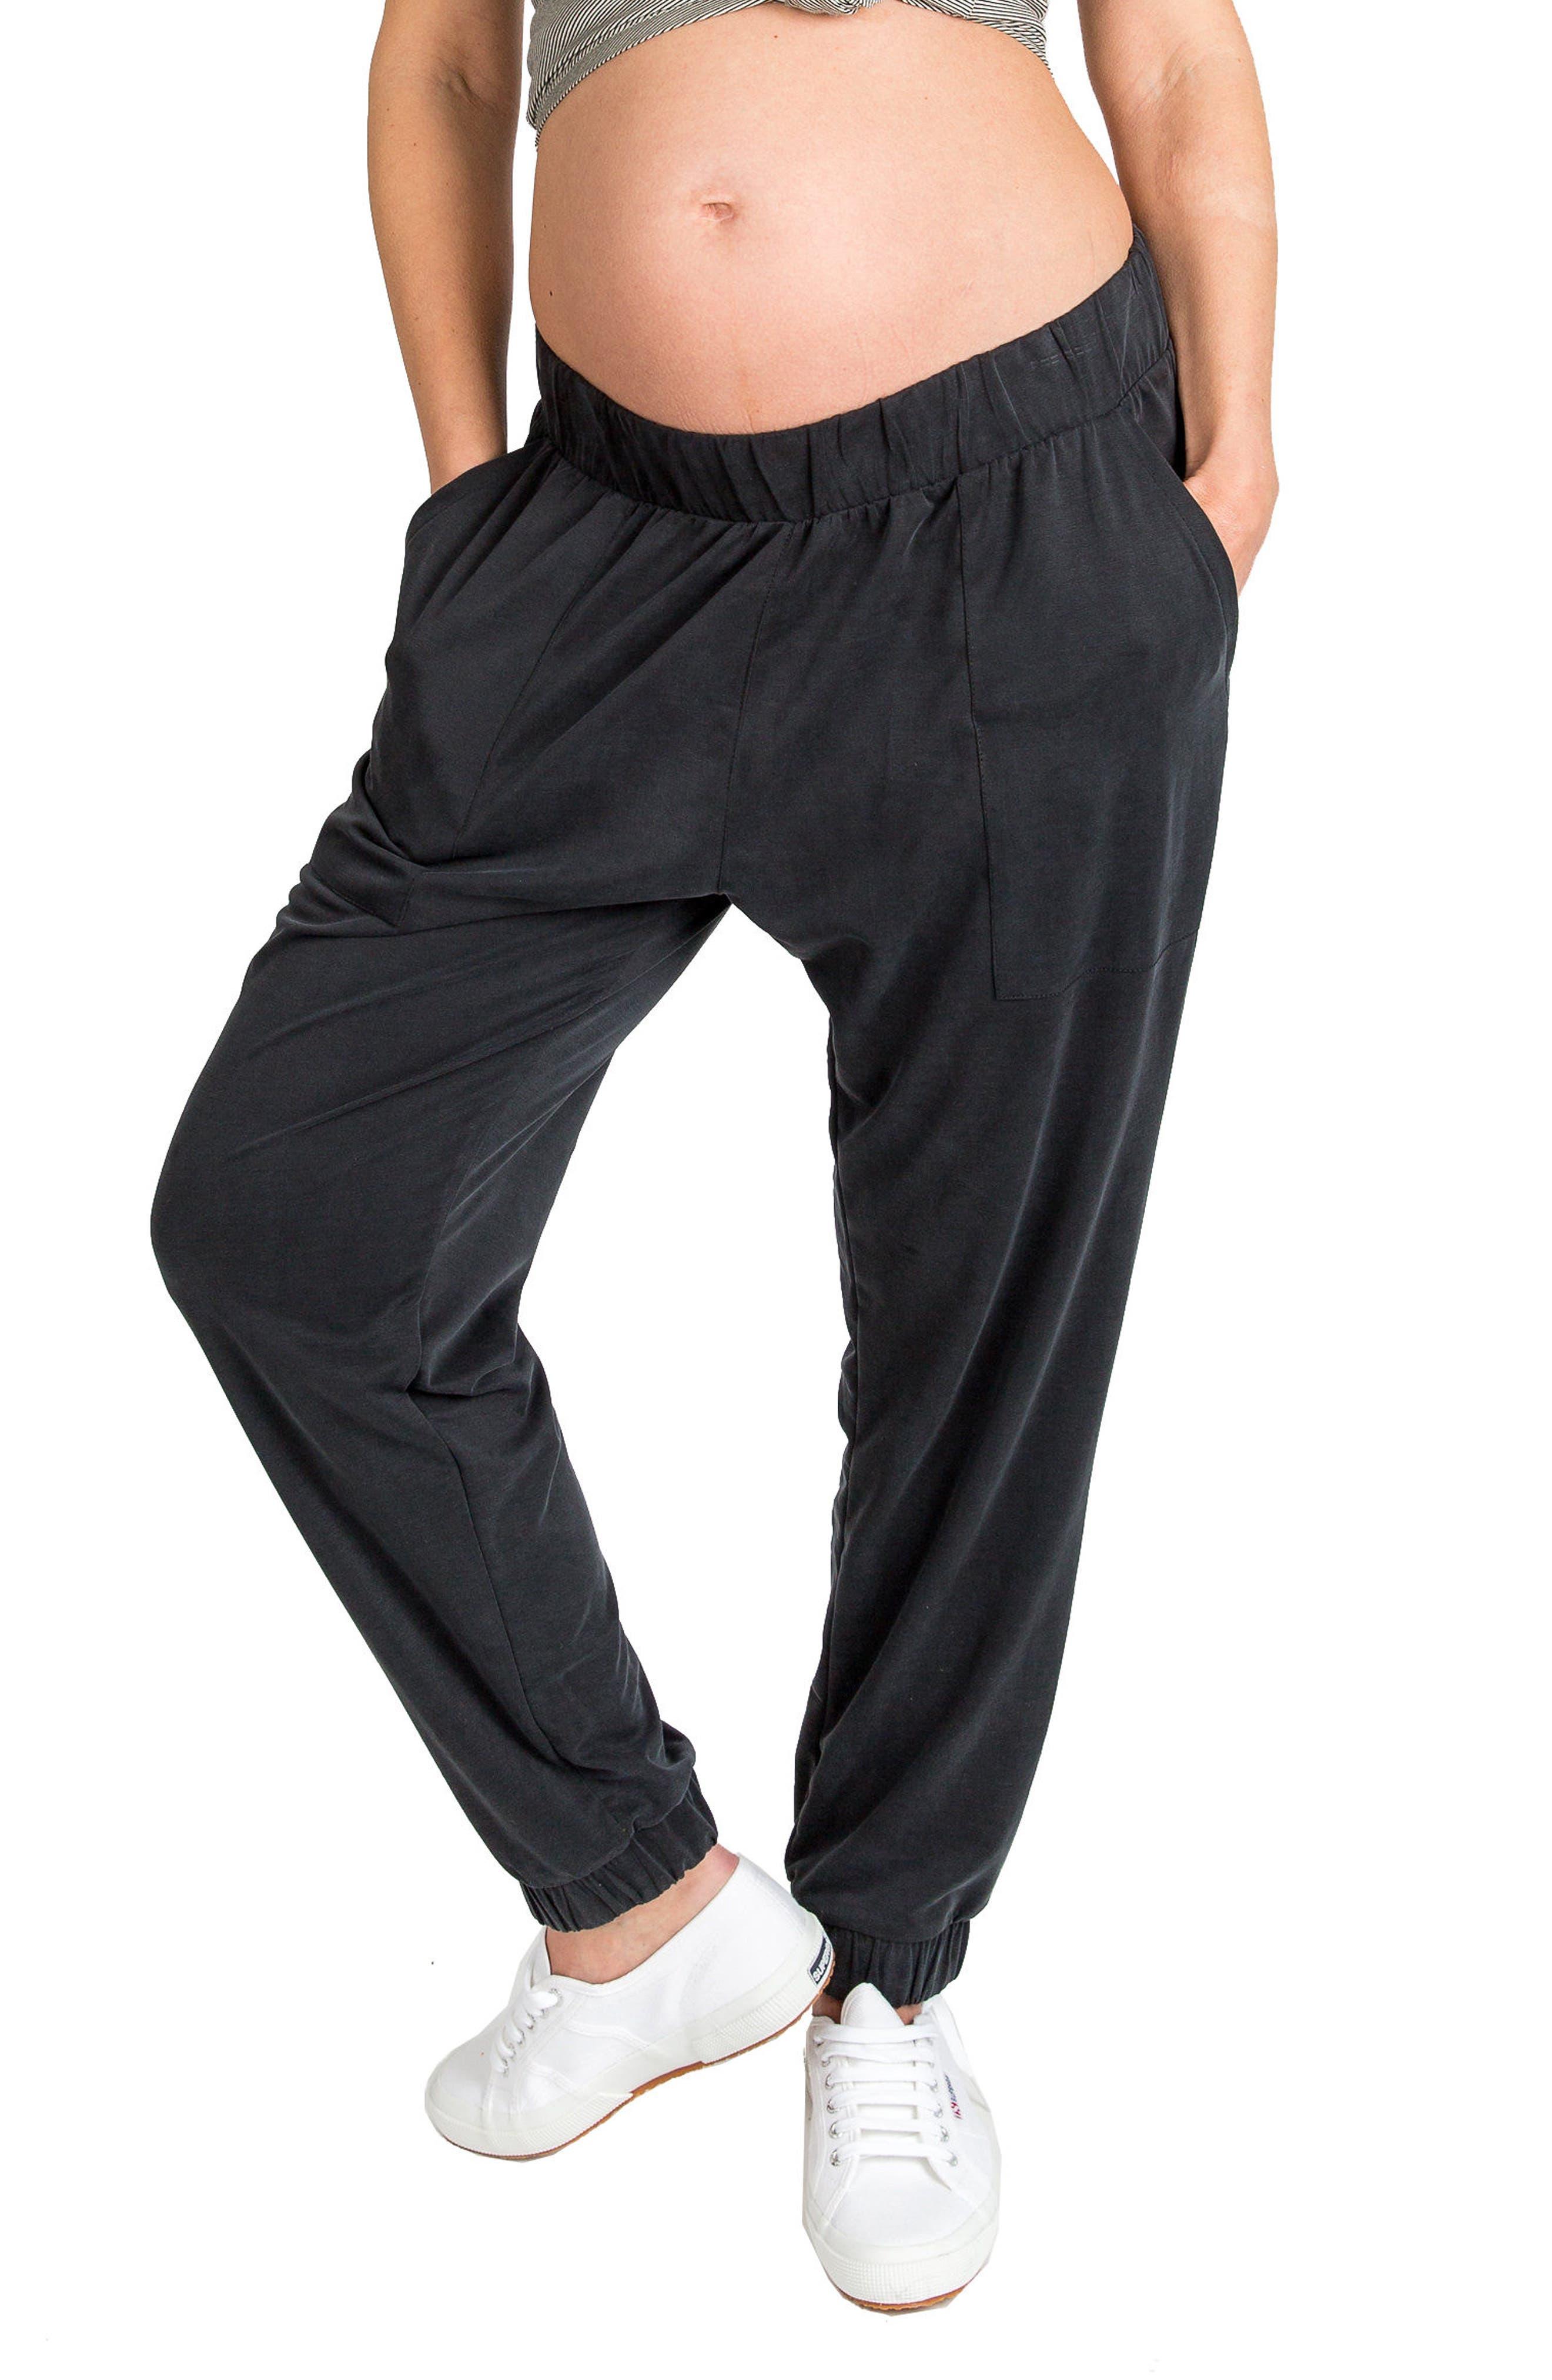 'Jenna' Maternity Pants,                         Main,                         color, Slate